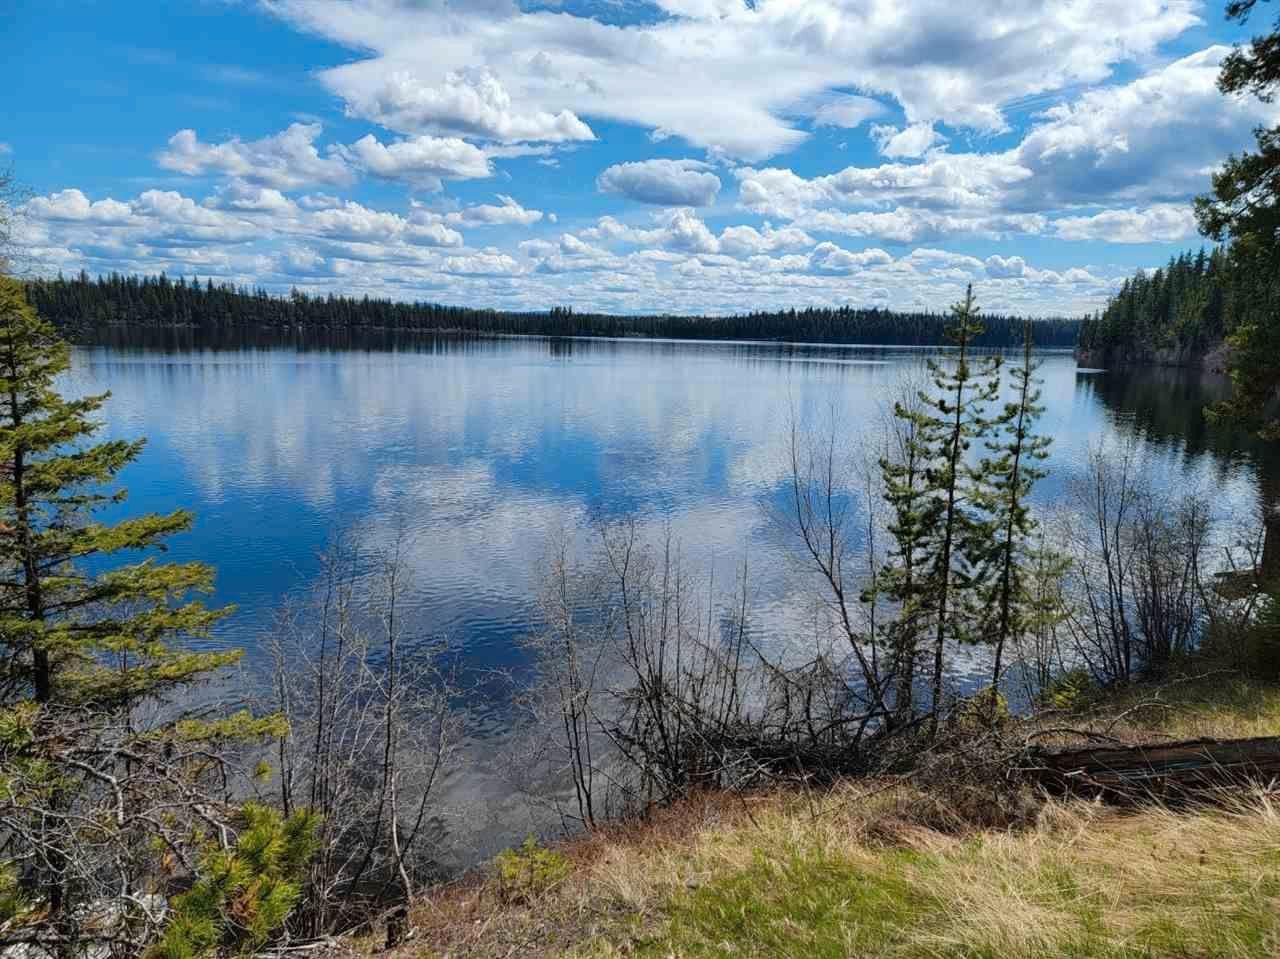 Main Photo: DL 1140 W MEIER Road: Cluculz Lake Land for sale (PG Rural West (Zone 77))  : MLS®# R2580023